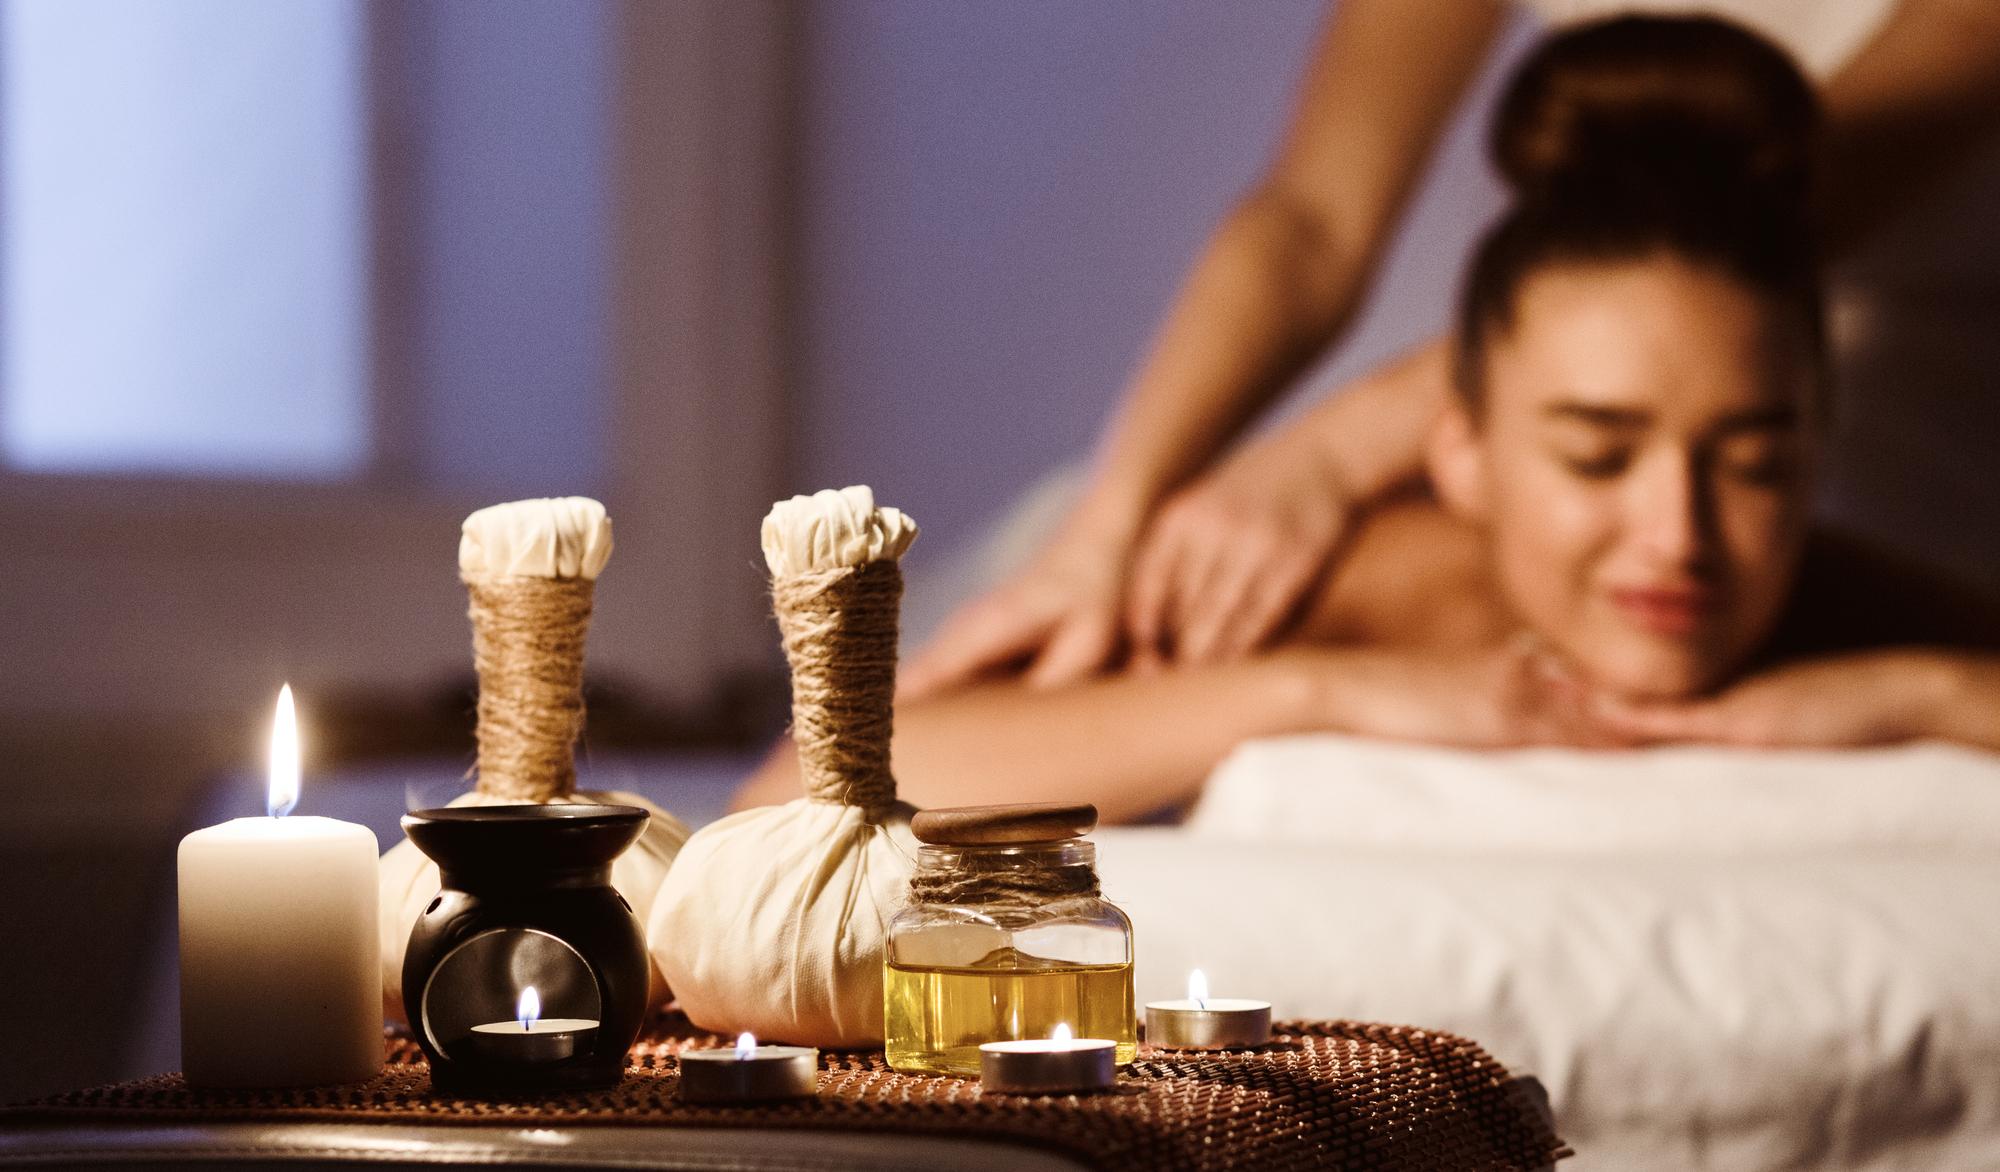 Asian massage therapy - Outcall massage - Las Vegas Room Massage